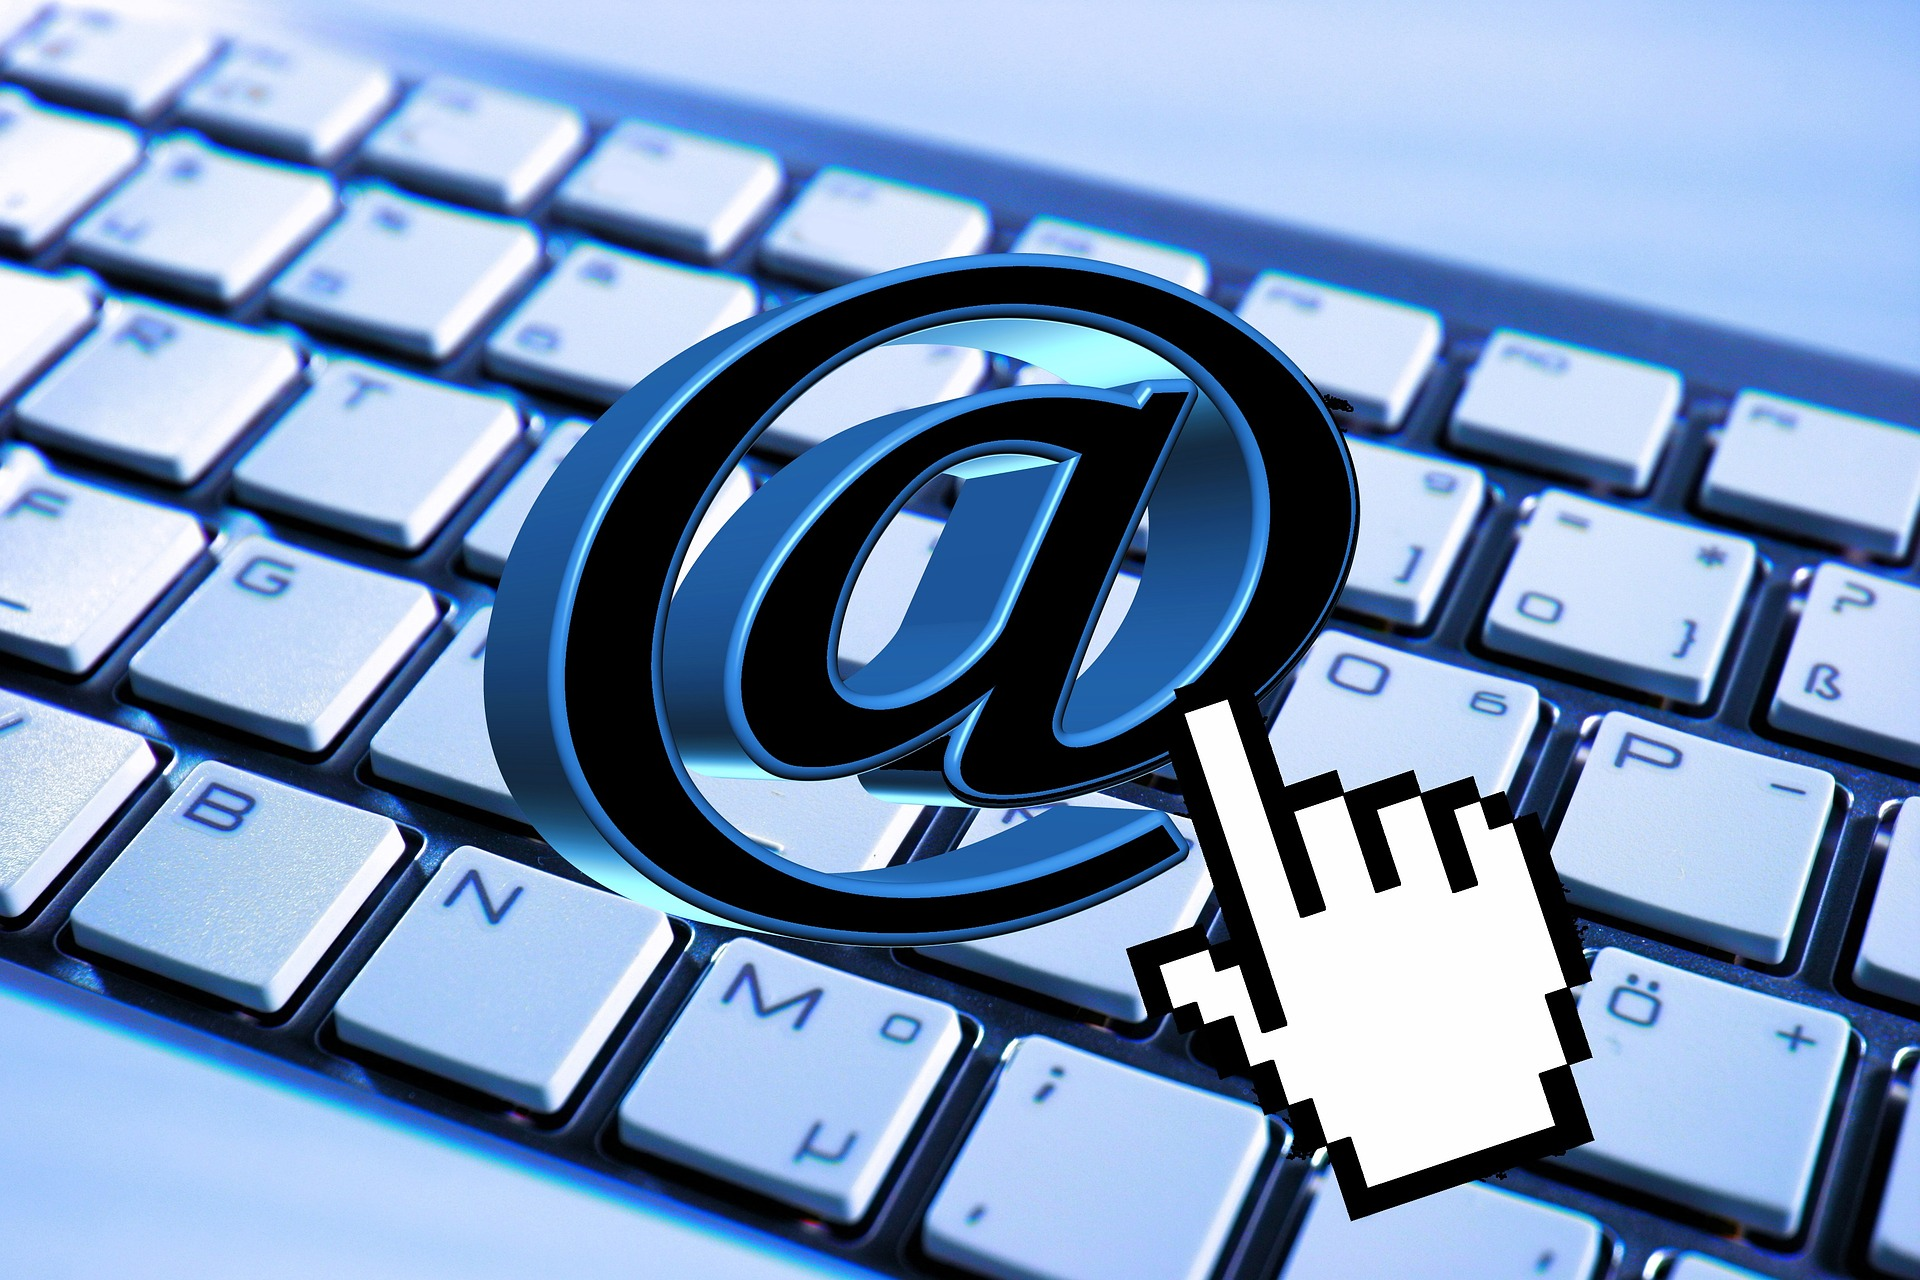 email-824310_1920.jpg